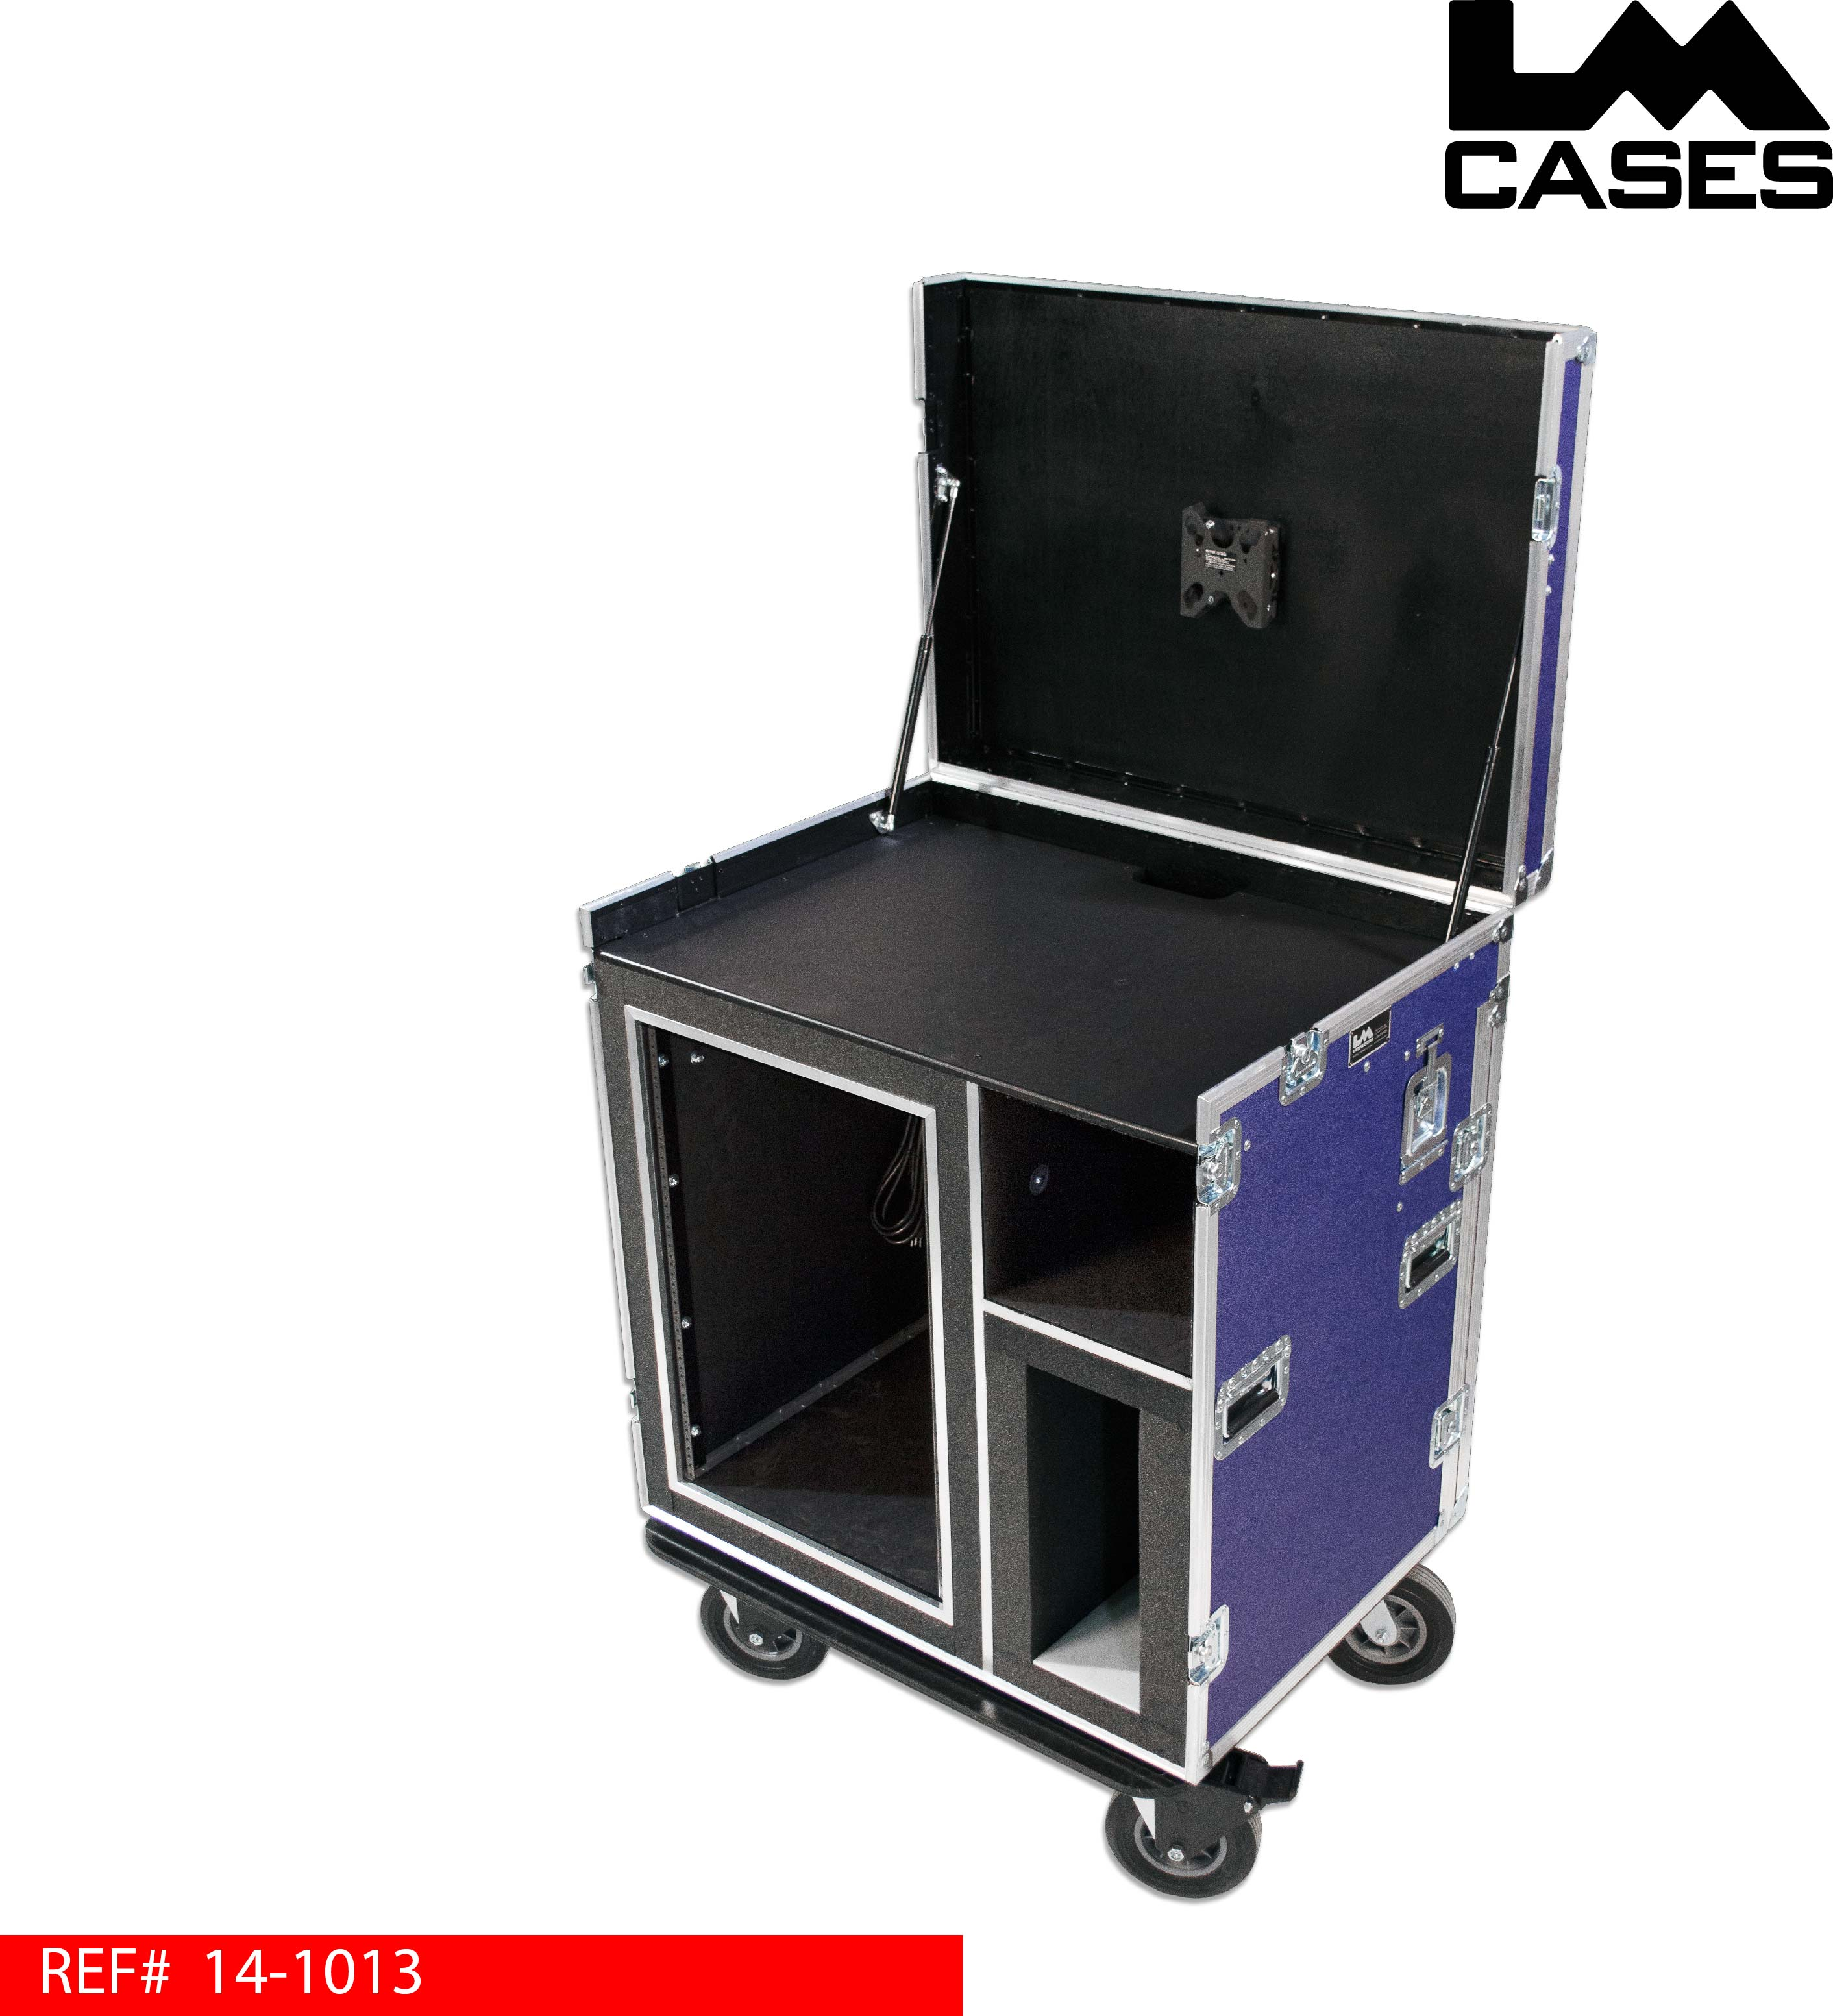 lm cases products. Black Bedroom Furniture Sets. Home Design Ideas